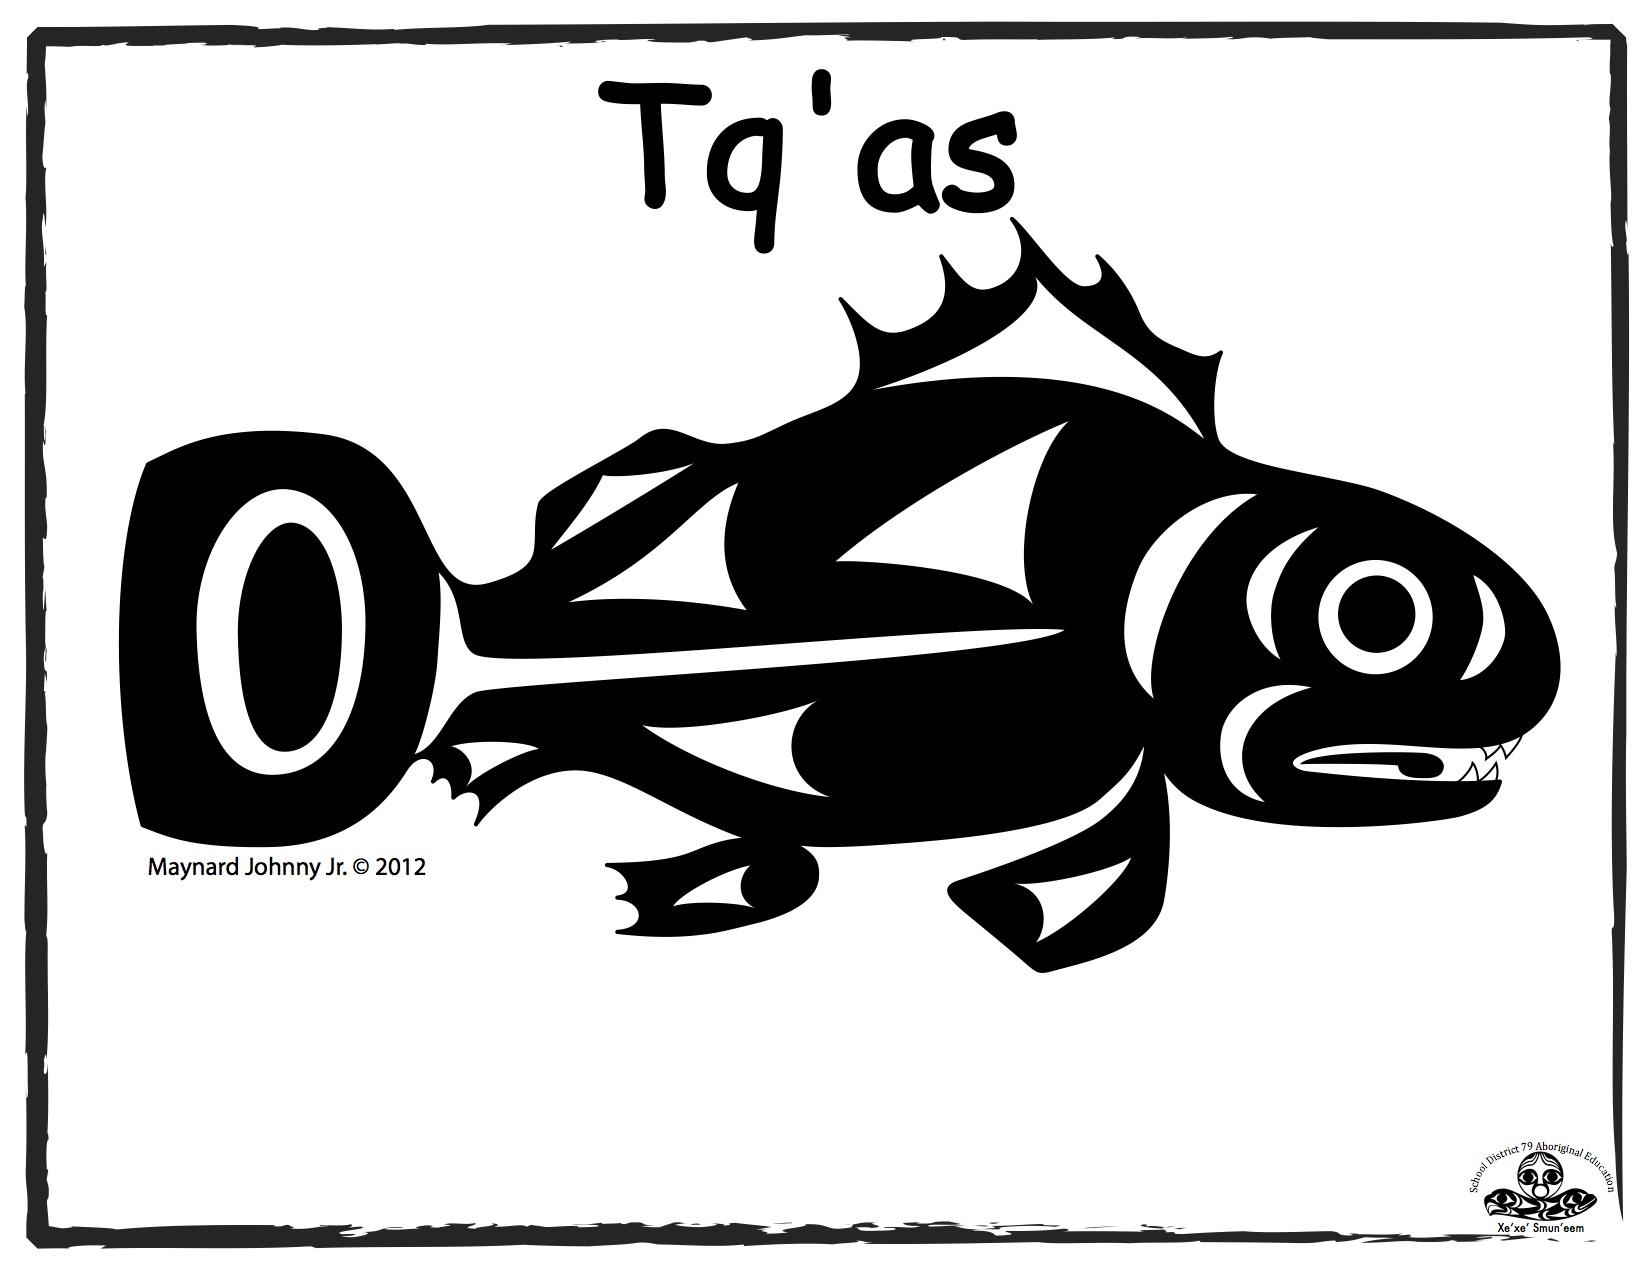 cod-tqas-basic